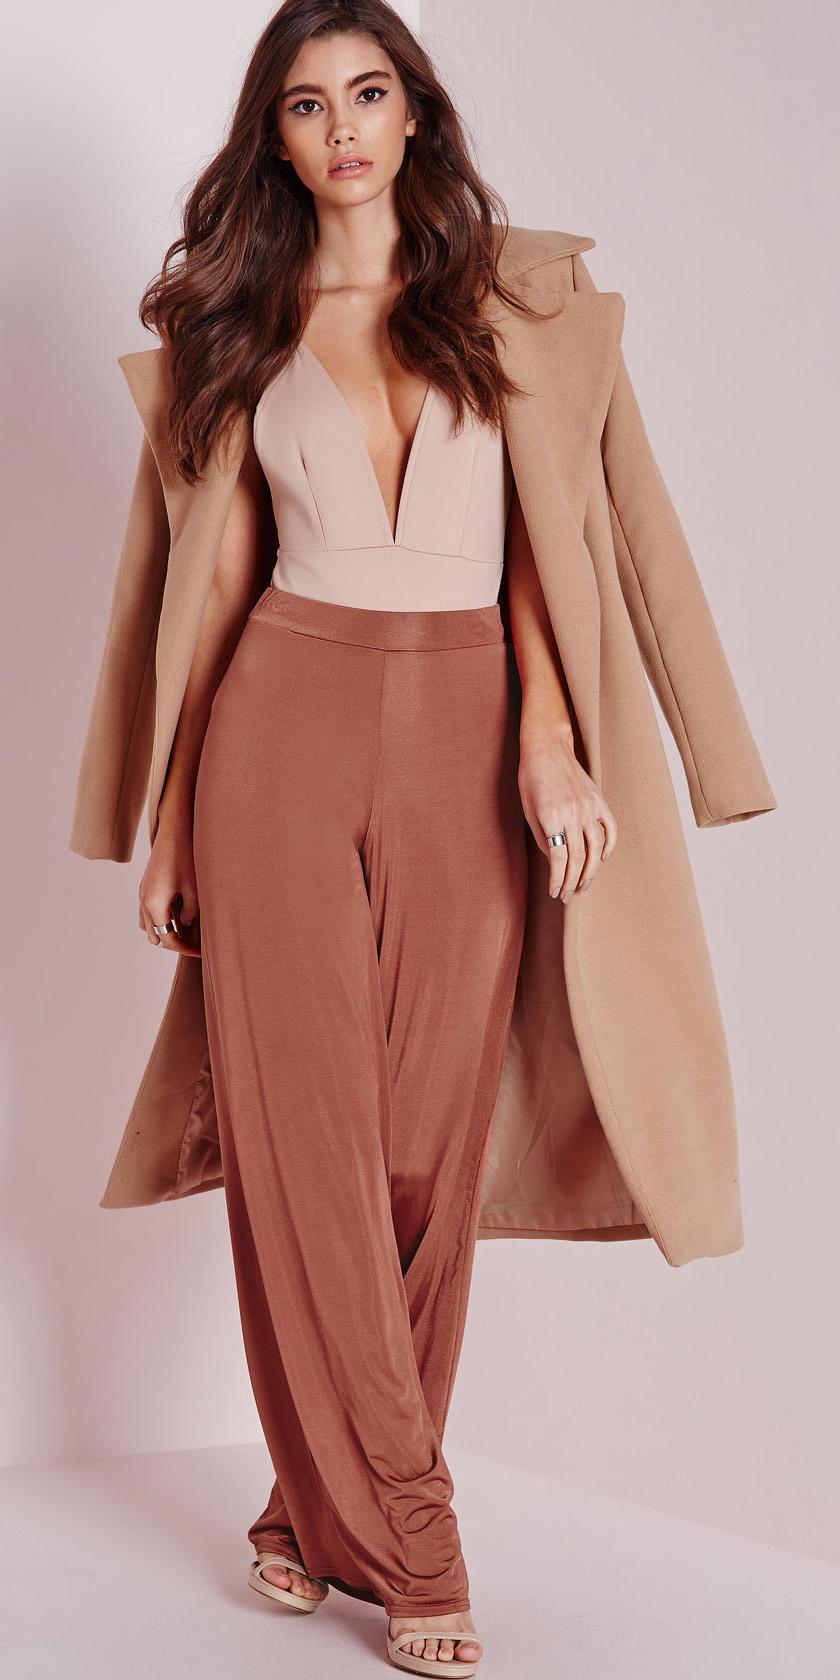 camel-wideleg-pants-tan-cami-tan-jacket-coat-tonal-hairr-tan-shoe-sandalh-fall-winter-dinner.jpeg